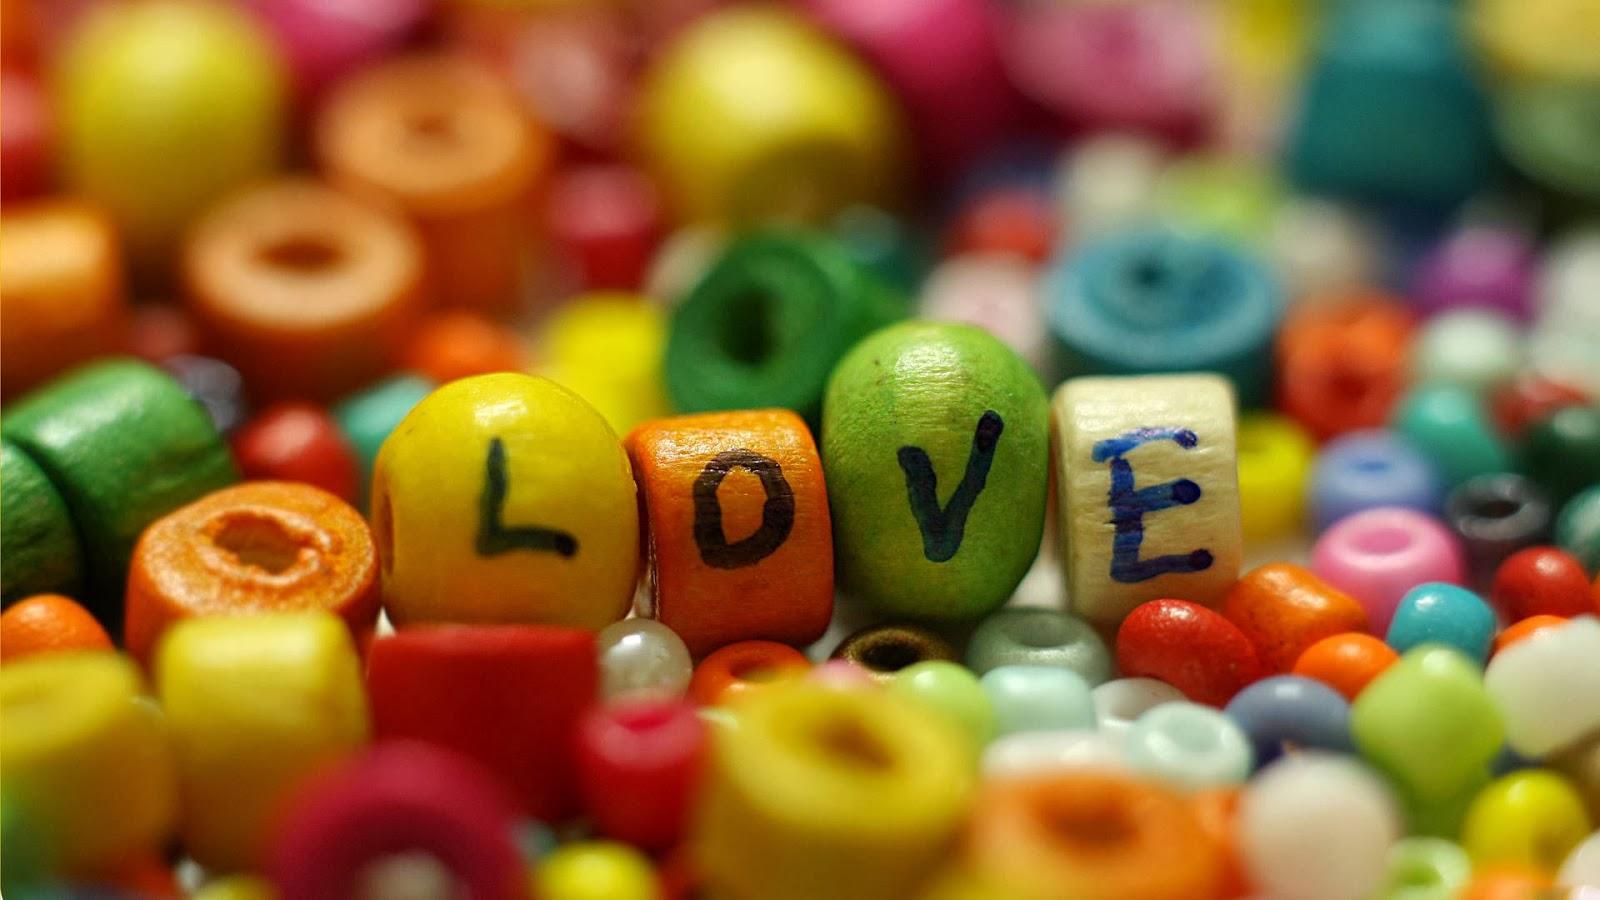 "<img src=""http://1.bp.blogspot.com/-PvaHro87xZk/UukILBx-evI/AAAAAAAAKlM/l5Js-heA0HA/s1600/love-colorful-wallpaper.jpg"" alt=""love colorful wallpaper"" />"